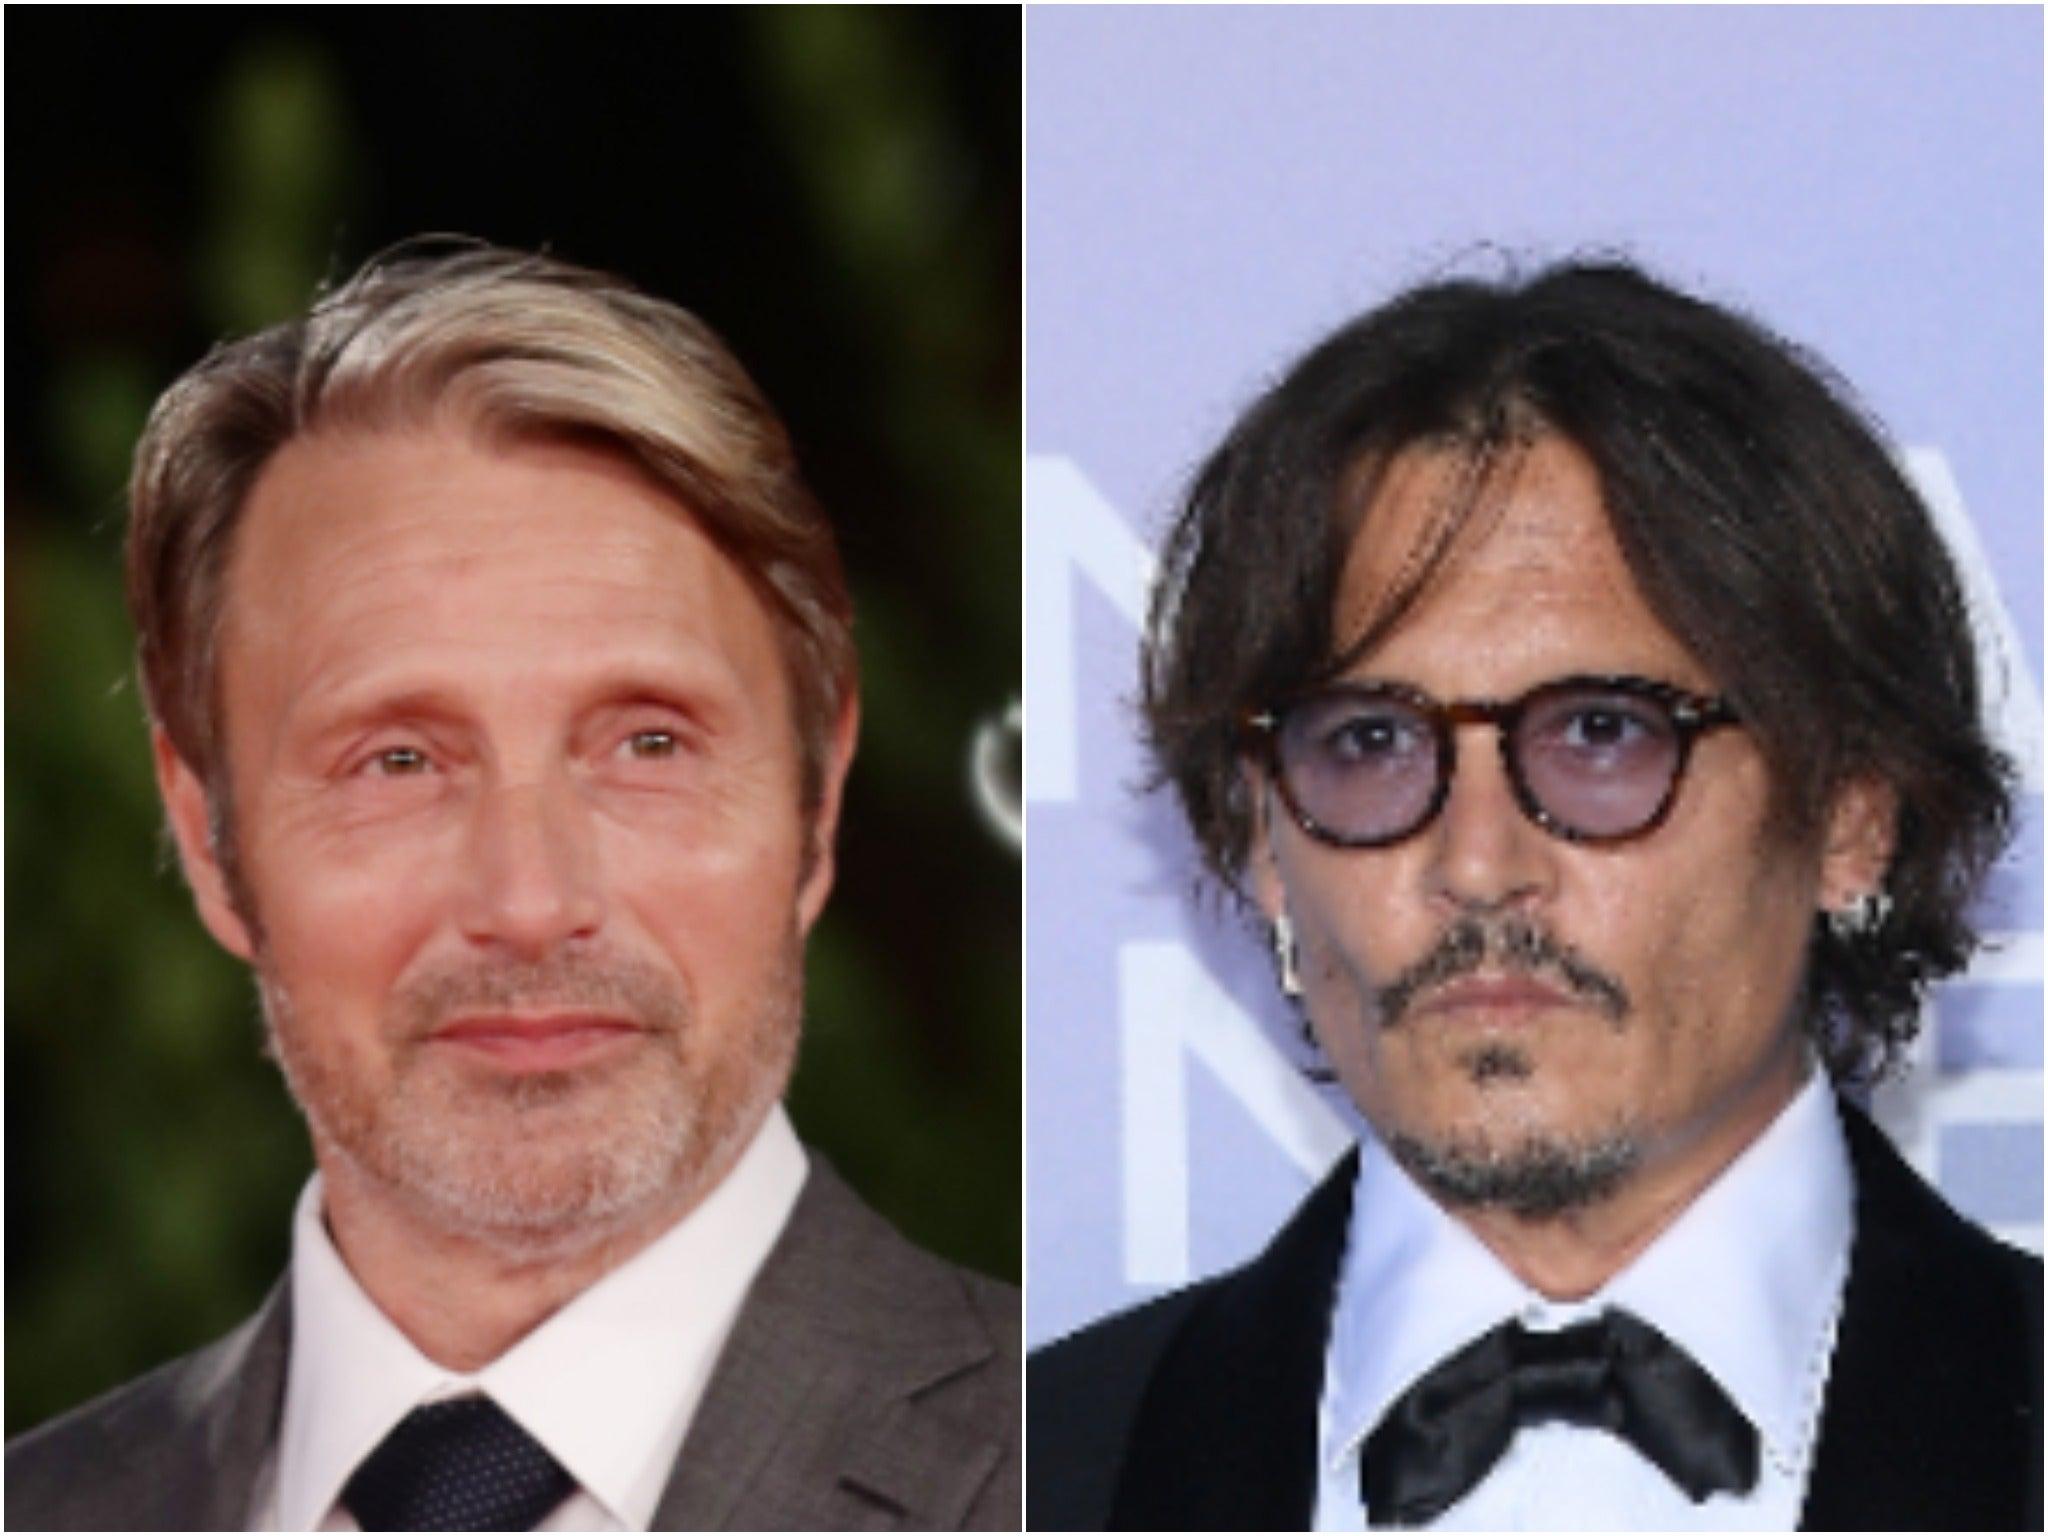 Mads Mikkelsen speaks out for first time after replacing Johnny Depp in Fantastic Beasts